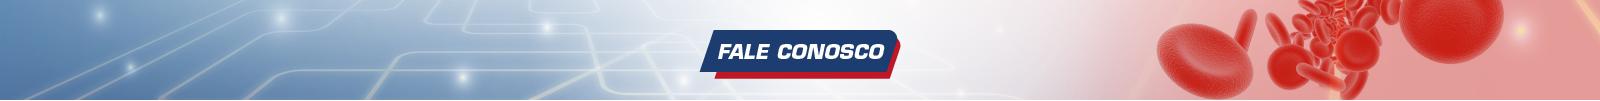 DC-banners 1000-fale conosco